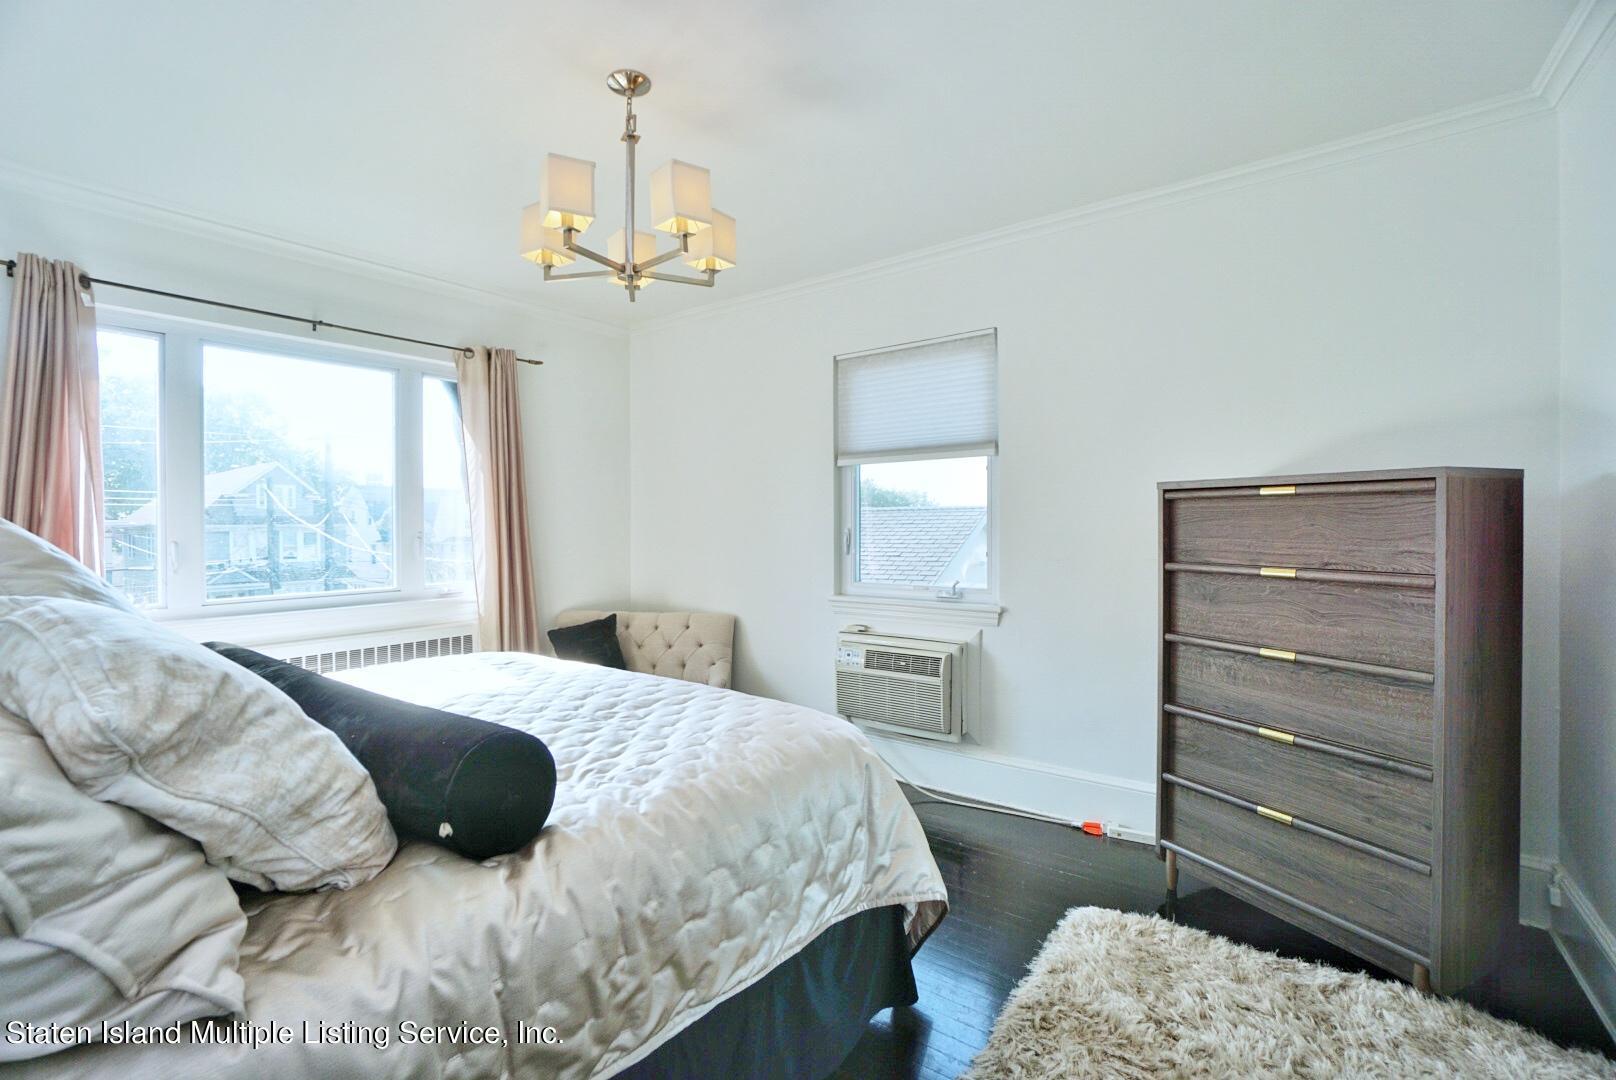 Single Family - Detached 311 Bement Avenue  Staten Island, NY 10310, MLS-1147133-22